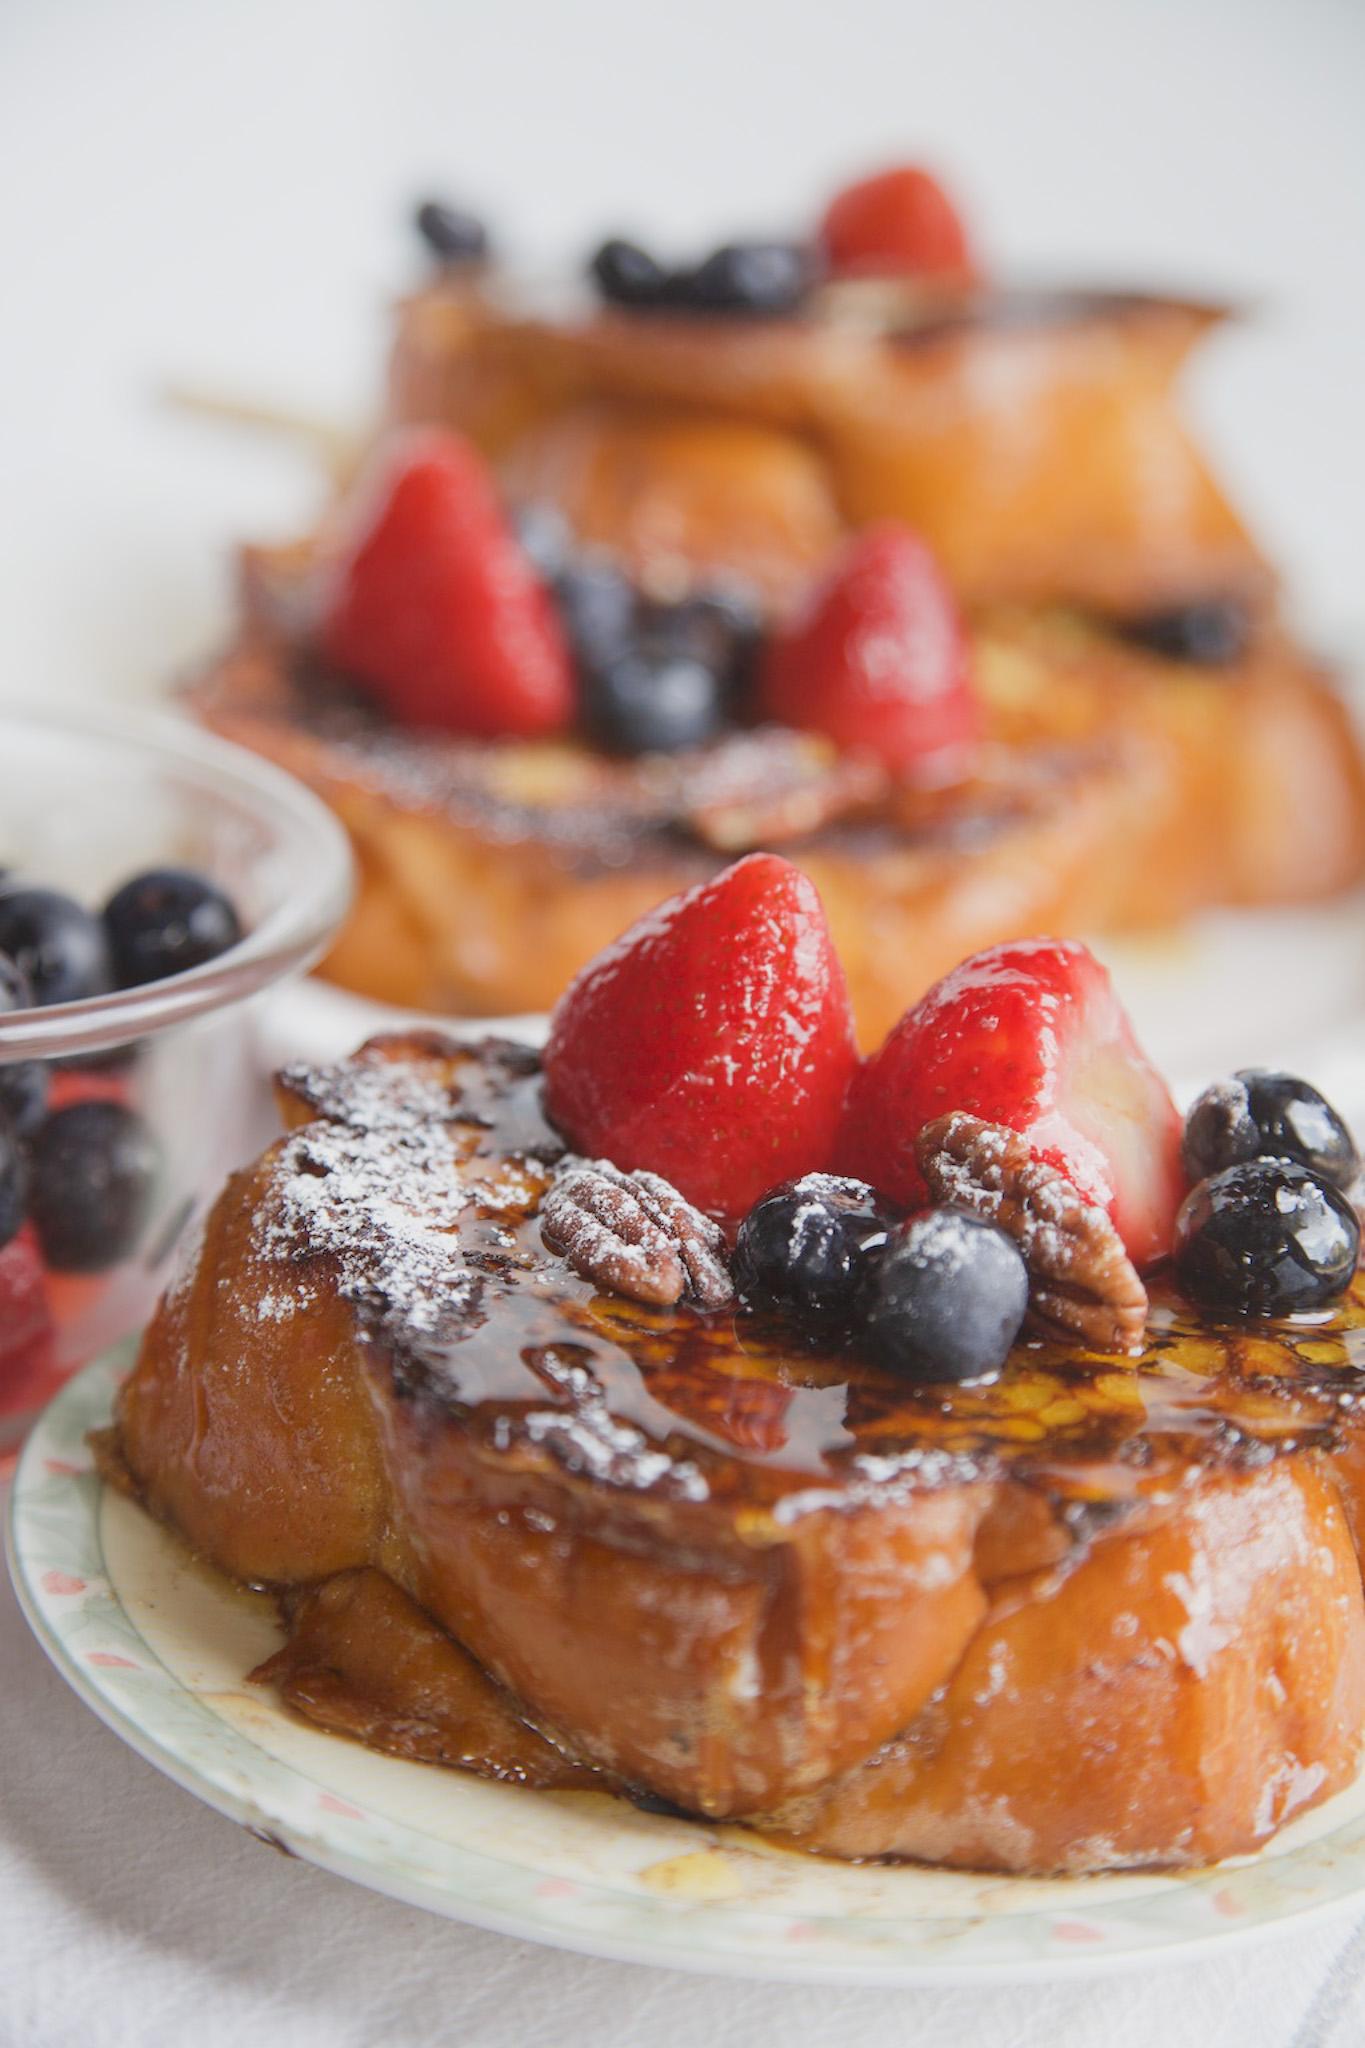 Berries & Cream Stuffed French Toast - MSST